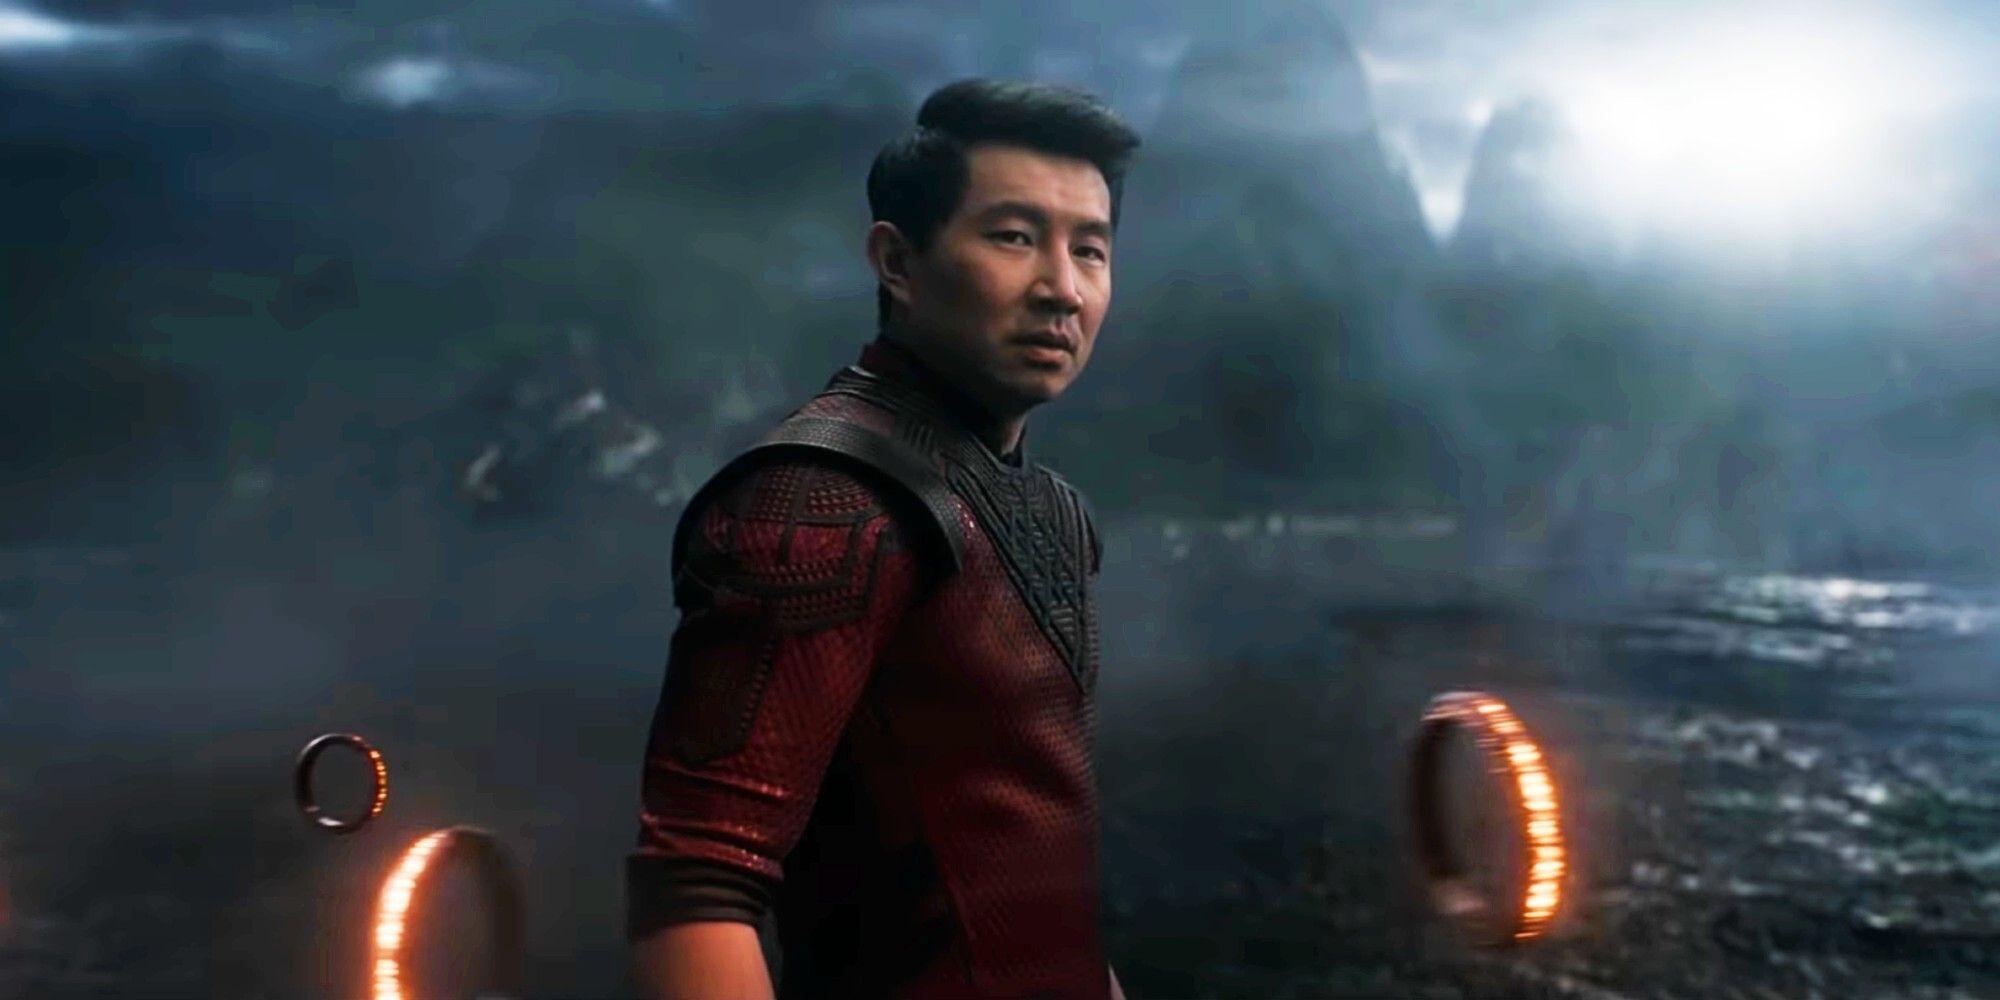 Shang-Chi Trailer Shows More Of The Ten Rings' Powers & A Superhero Landing